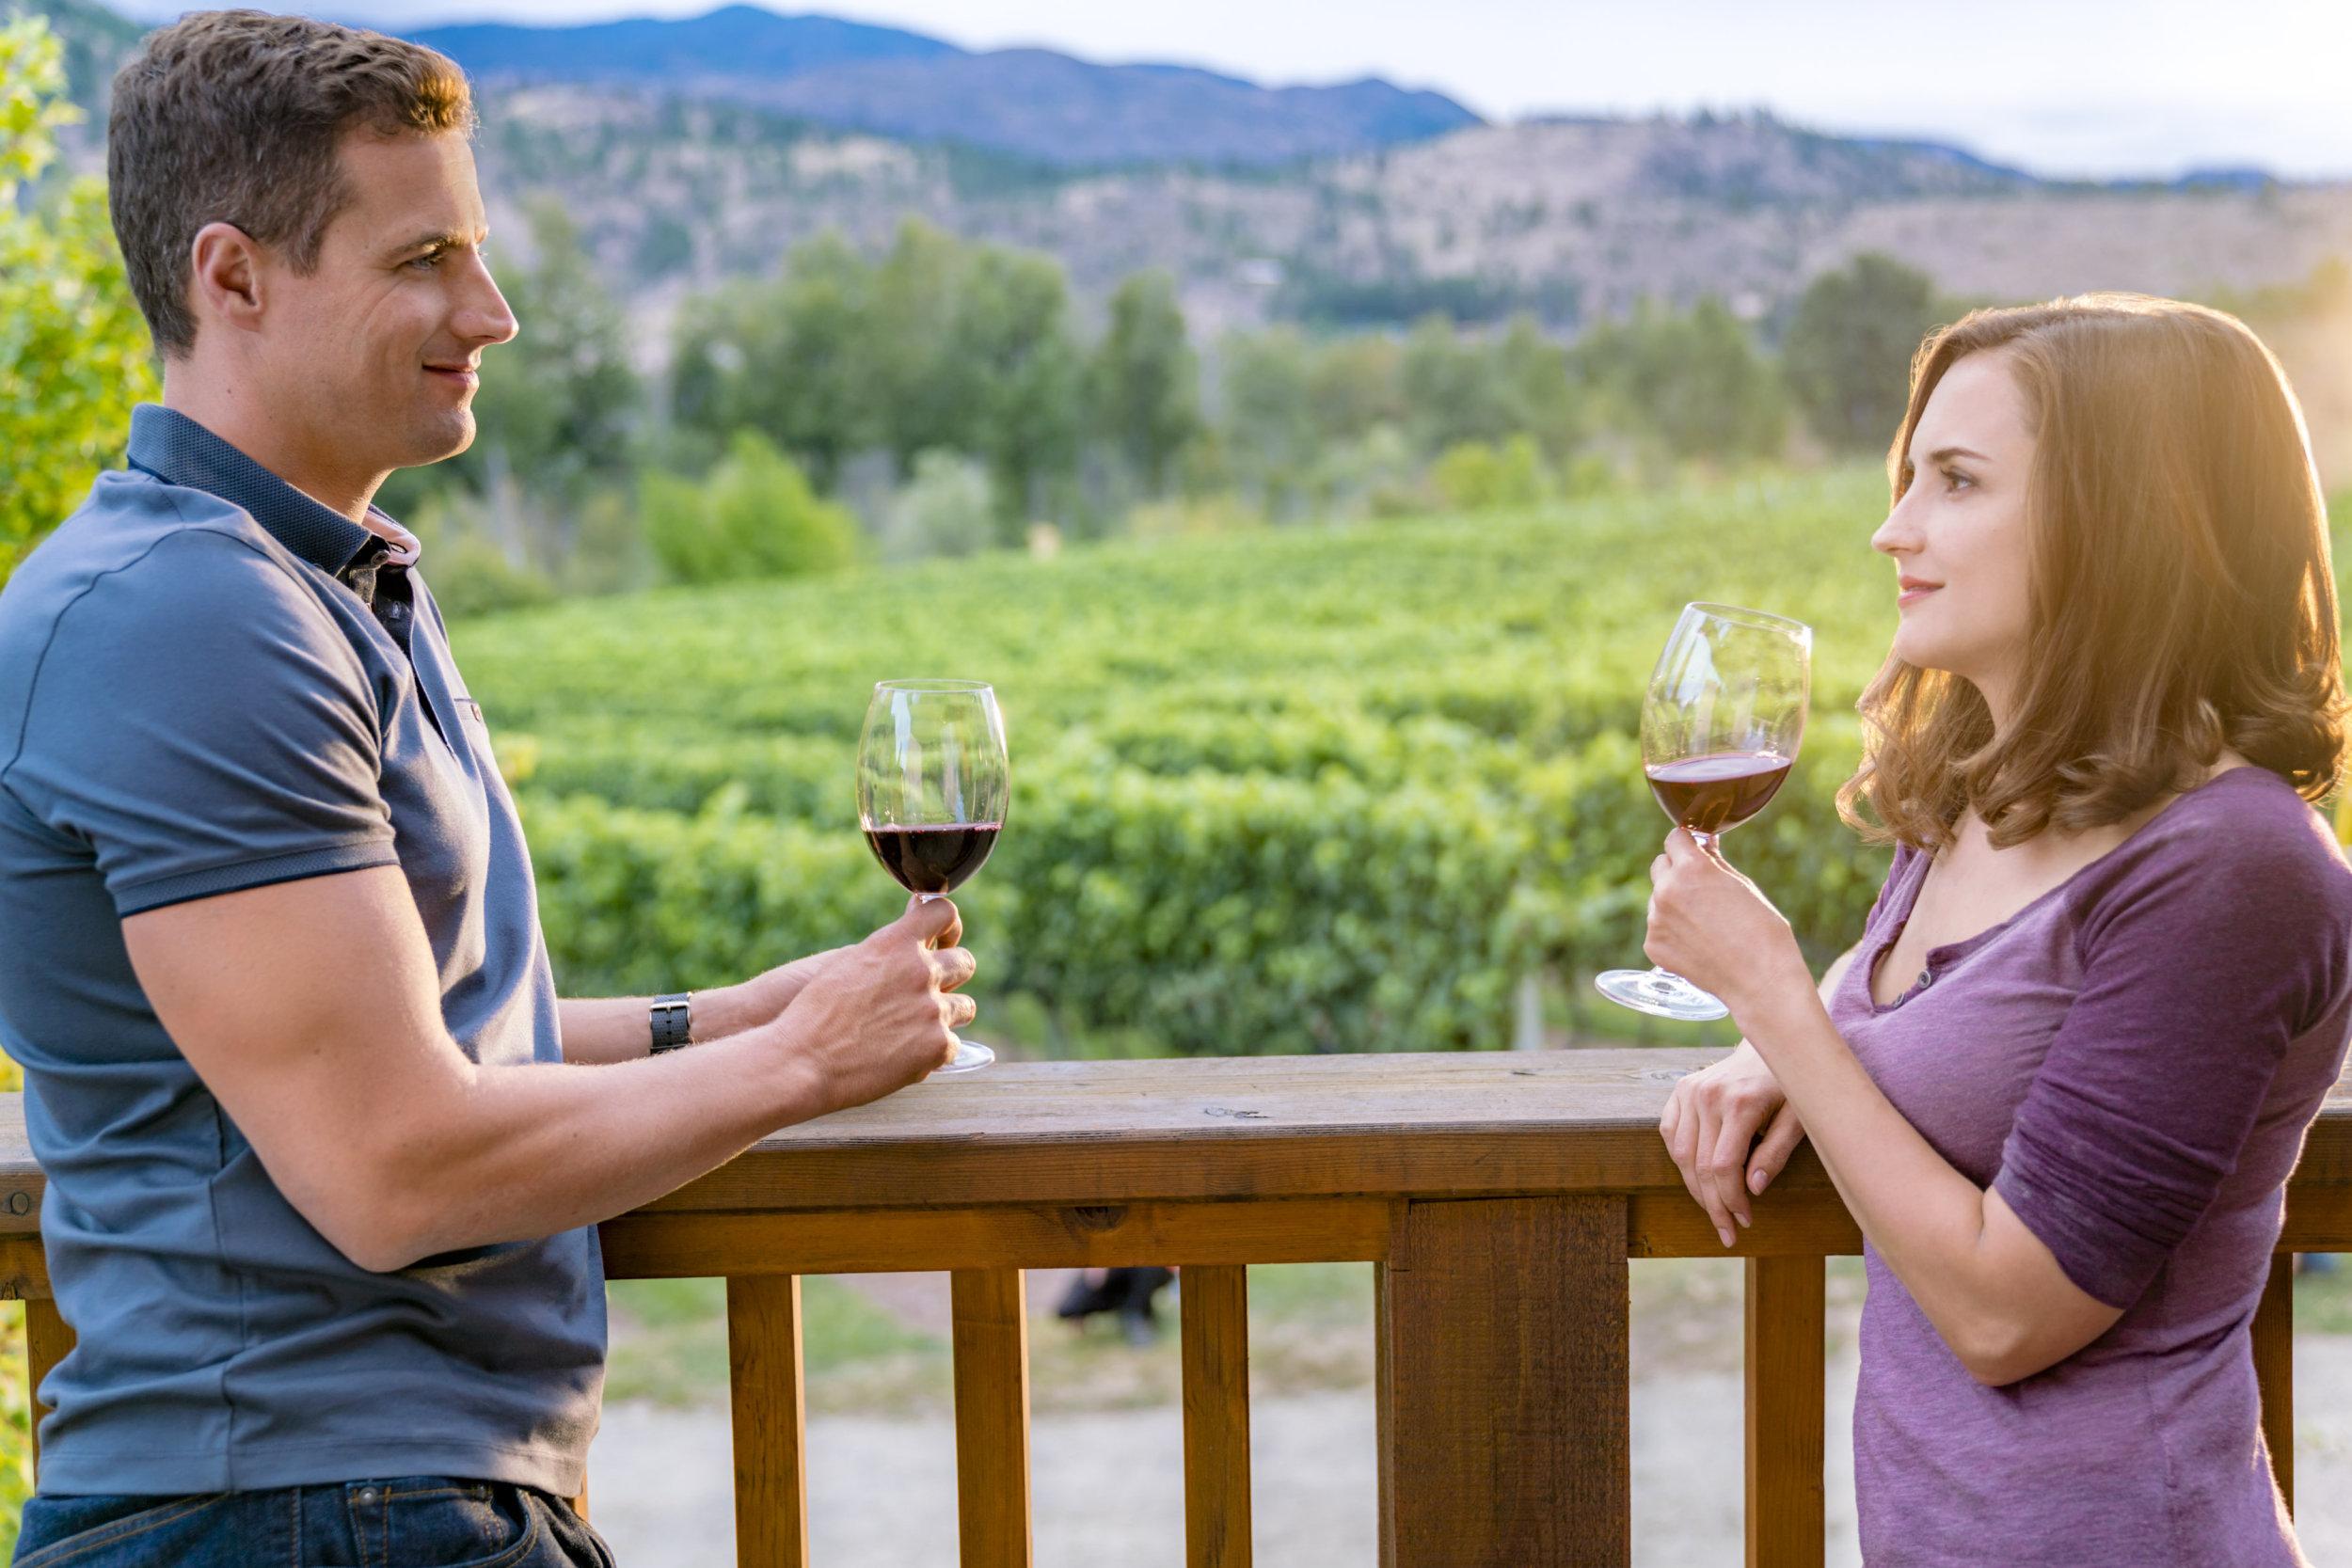 Autumn in the Vineyard (TV Movie 2016) - IMDb